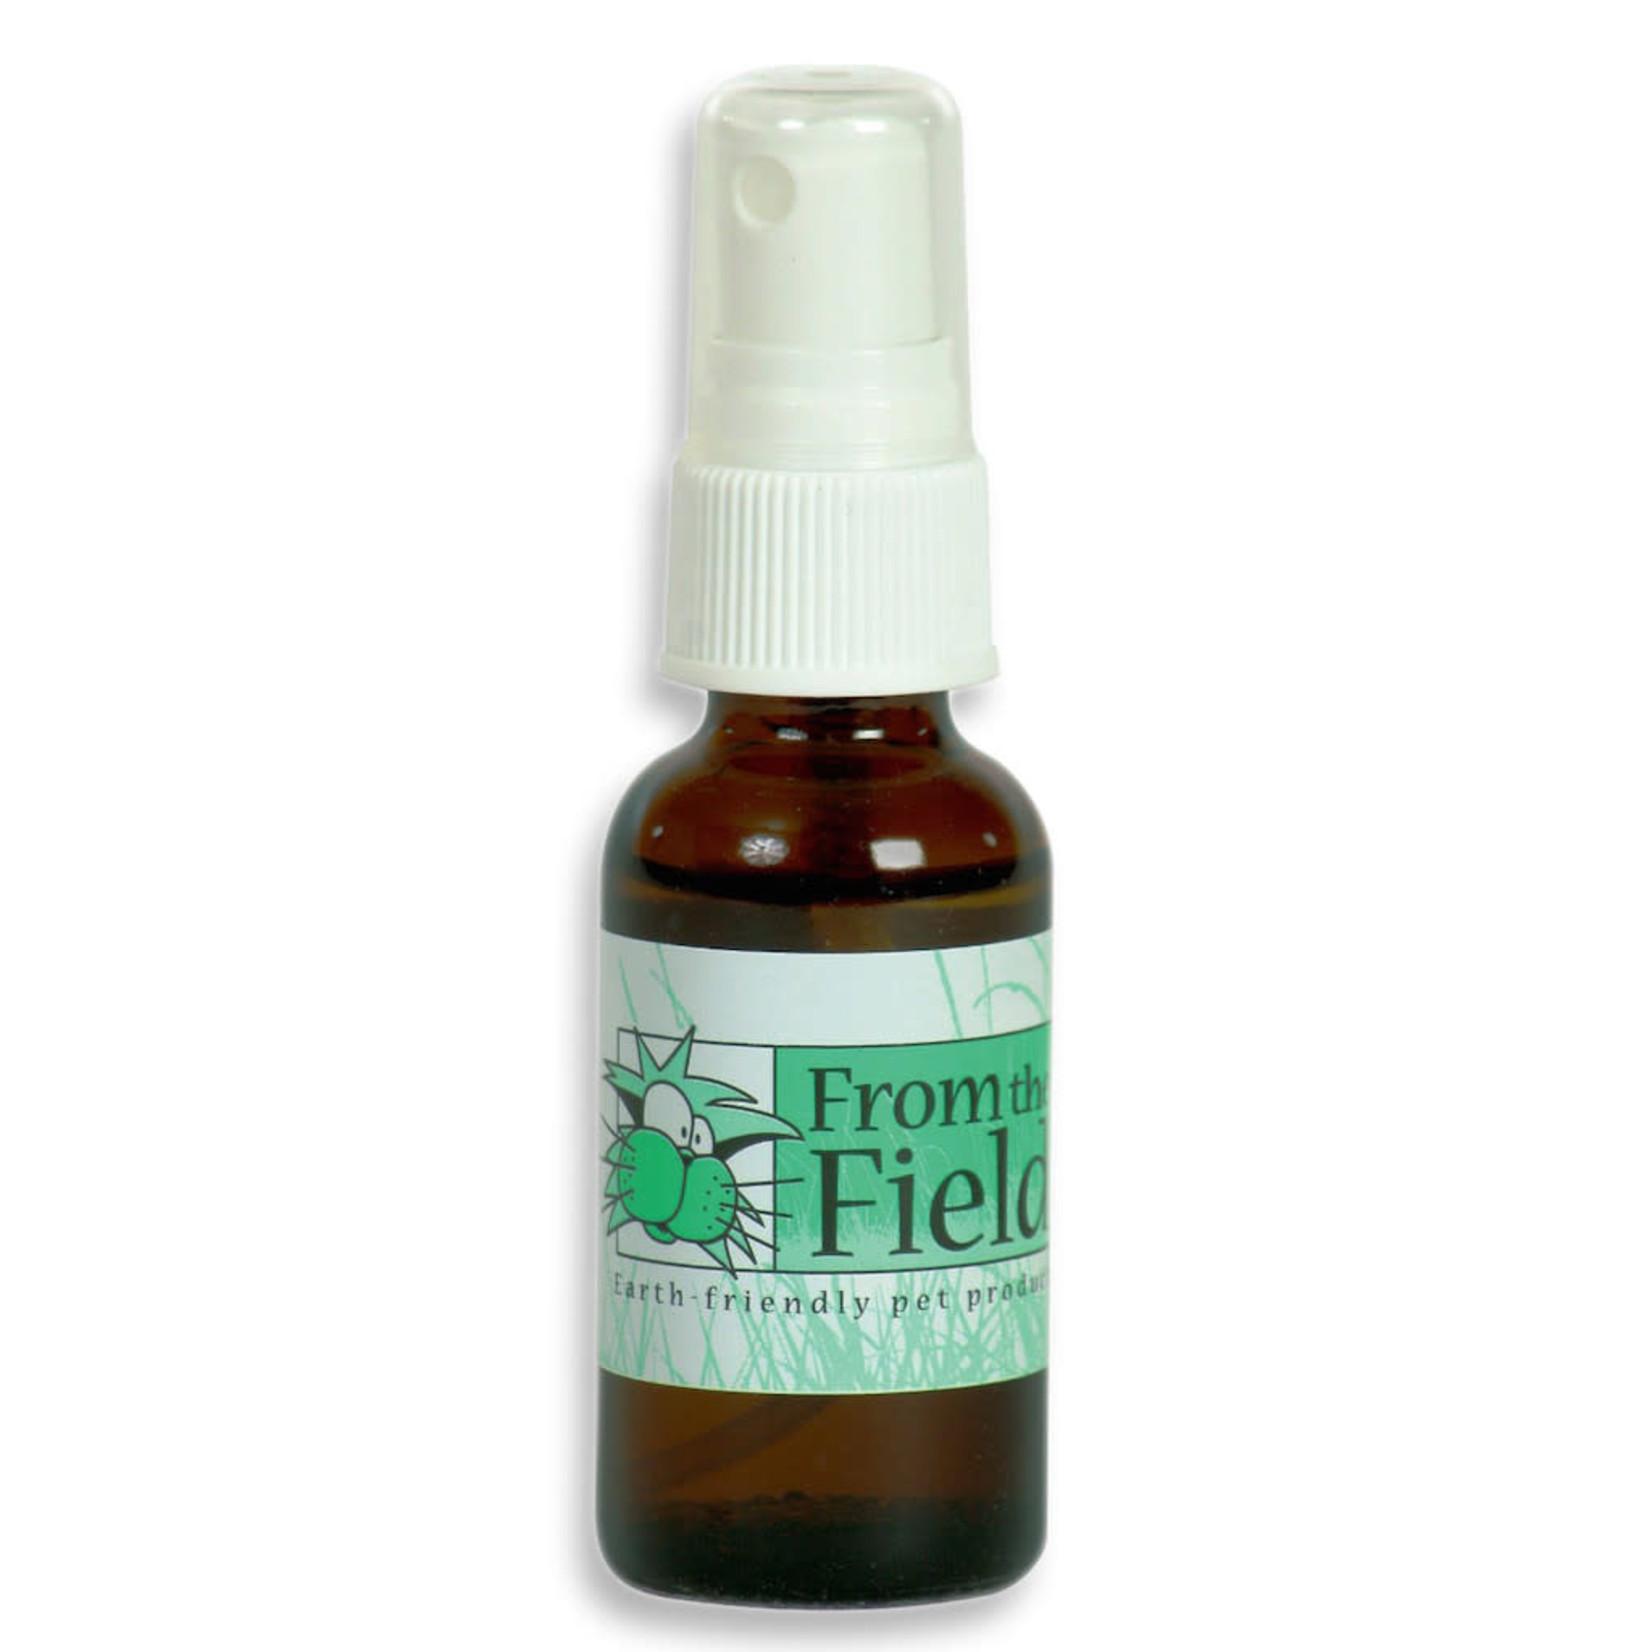 From The Field From The Field Catnip Essential Oil Rejuvenator Spray